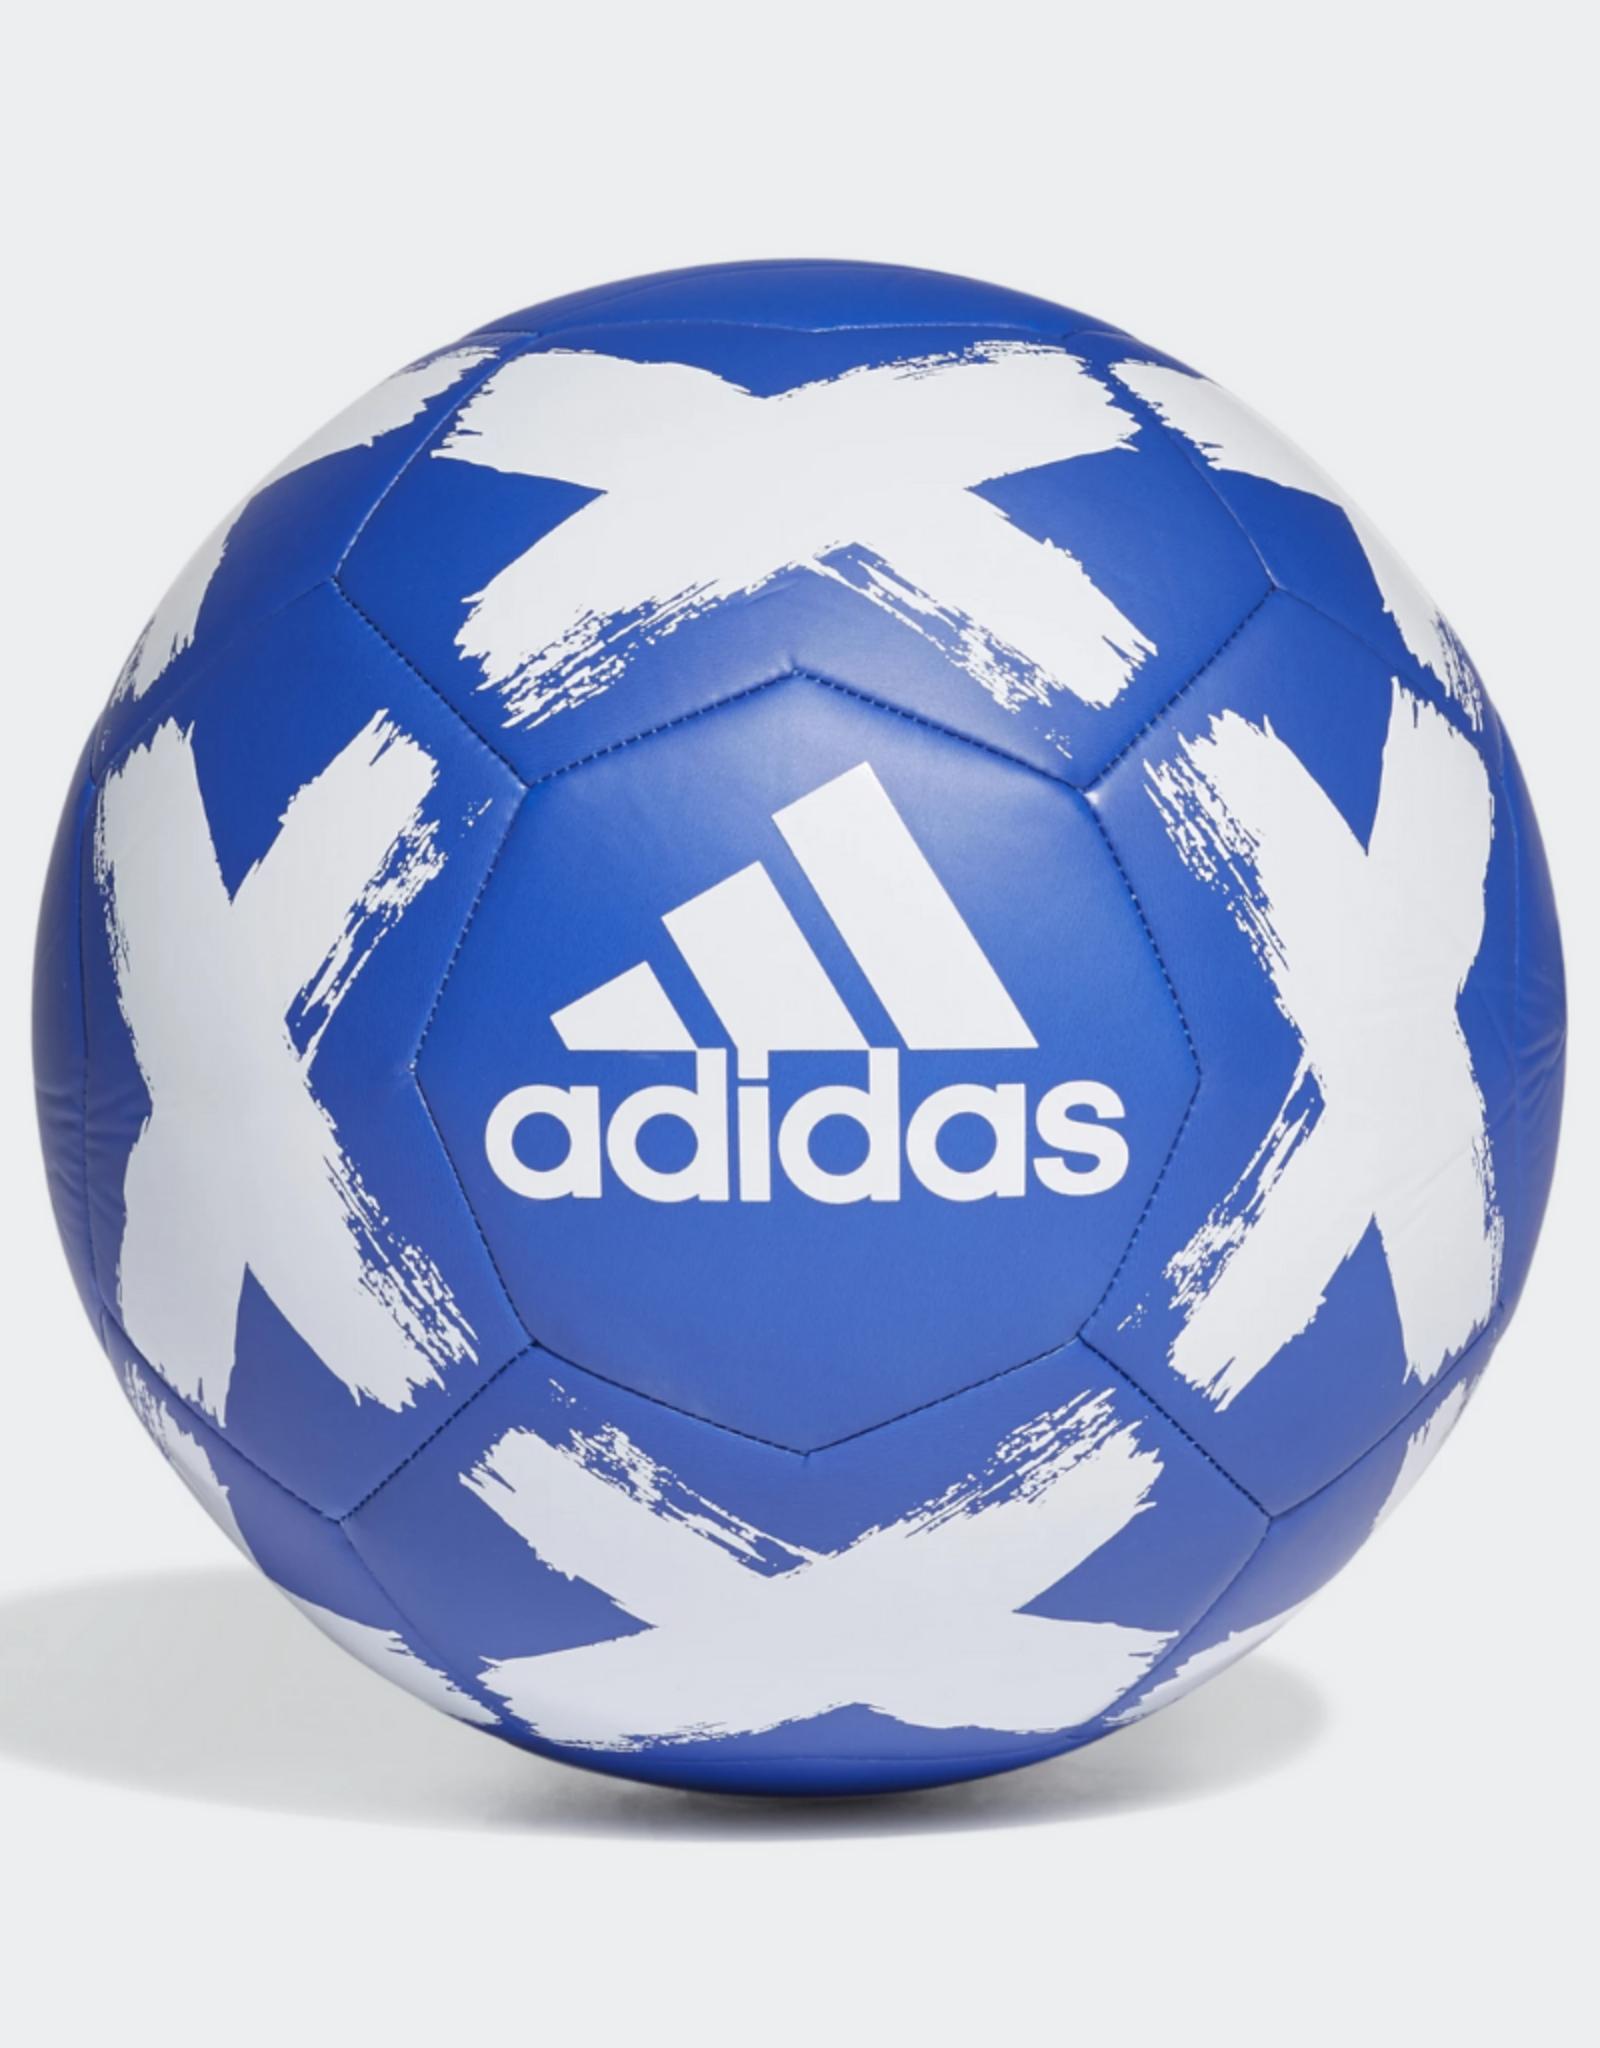 Adidas Adidas Starlancer Club Soccer Ball Blue/White